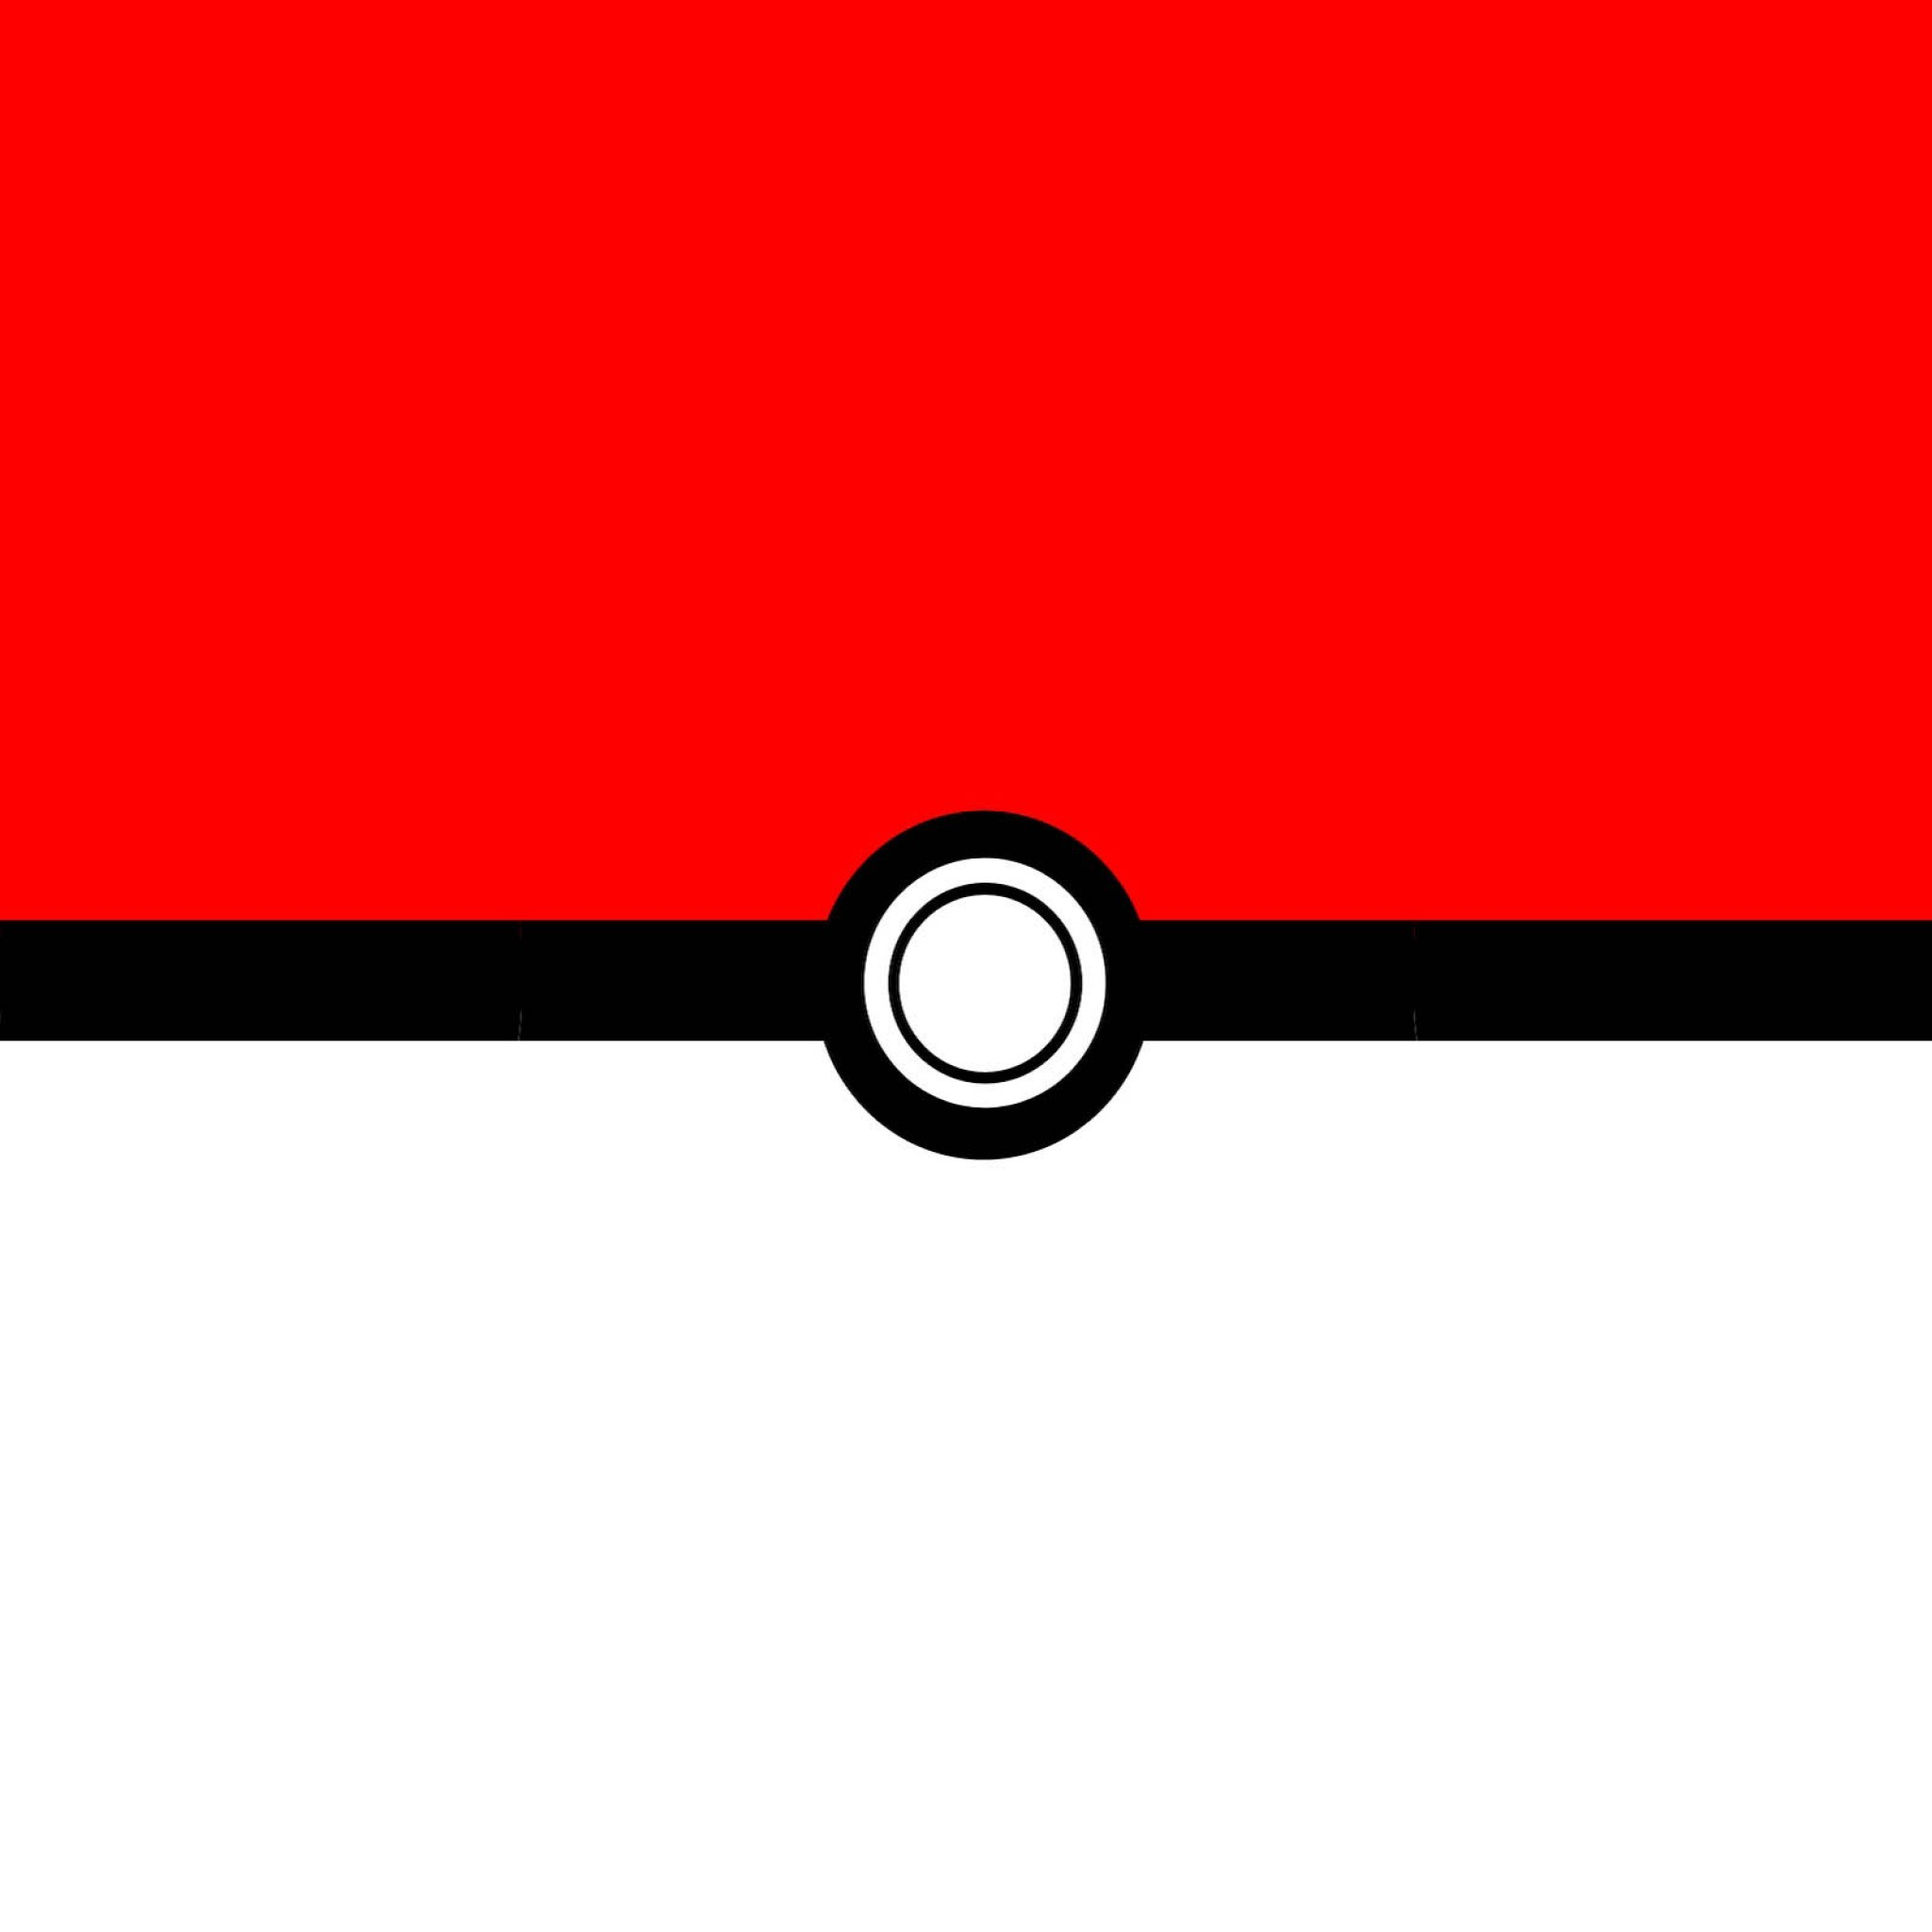 Pokemon Iphone Wallpaper Hd 2048x2048px pokemon iphone 2048x2048